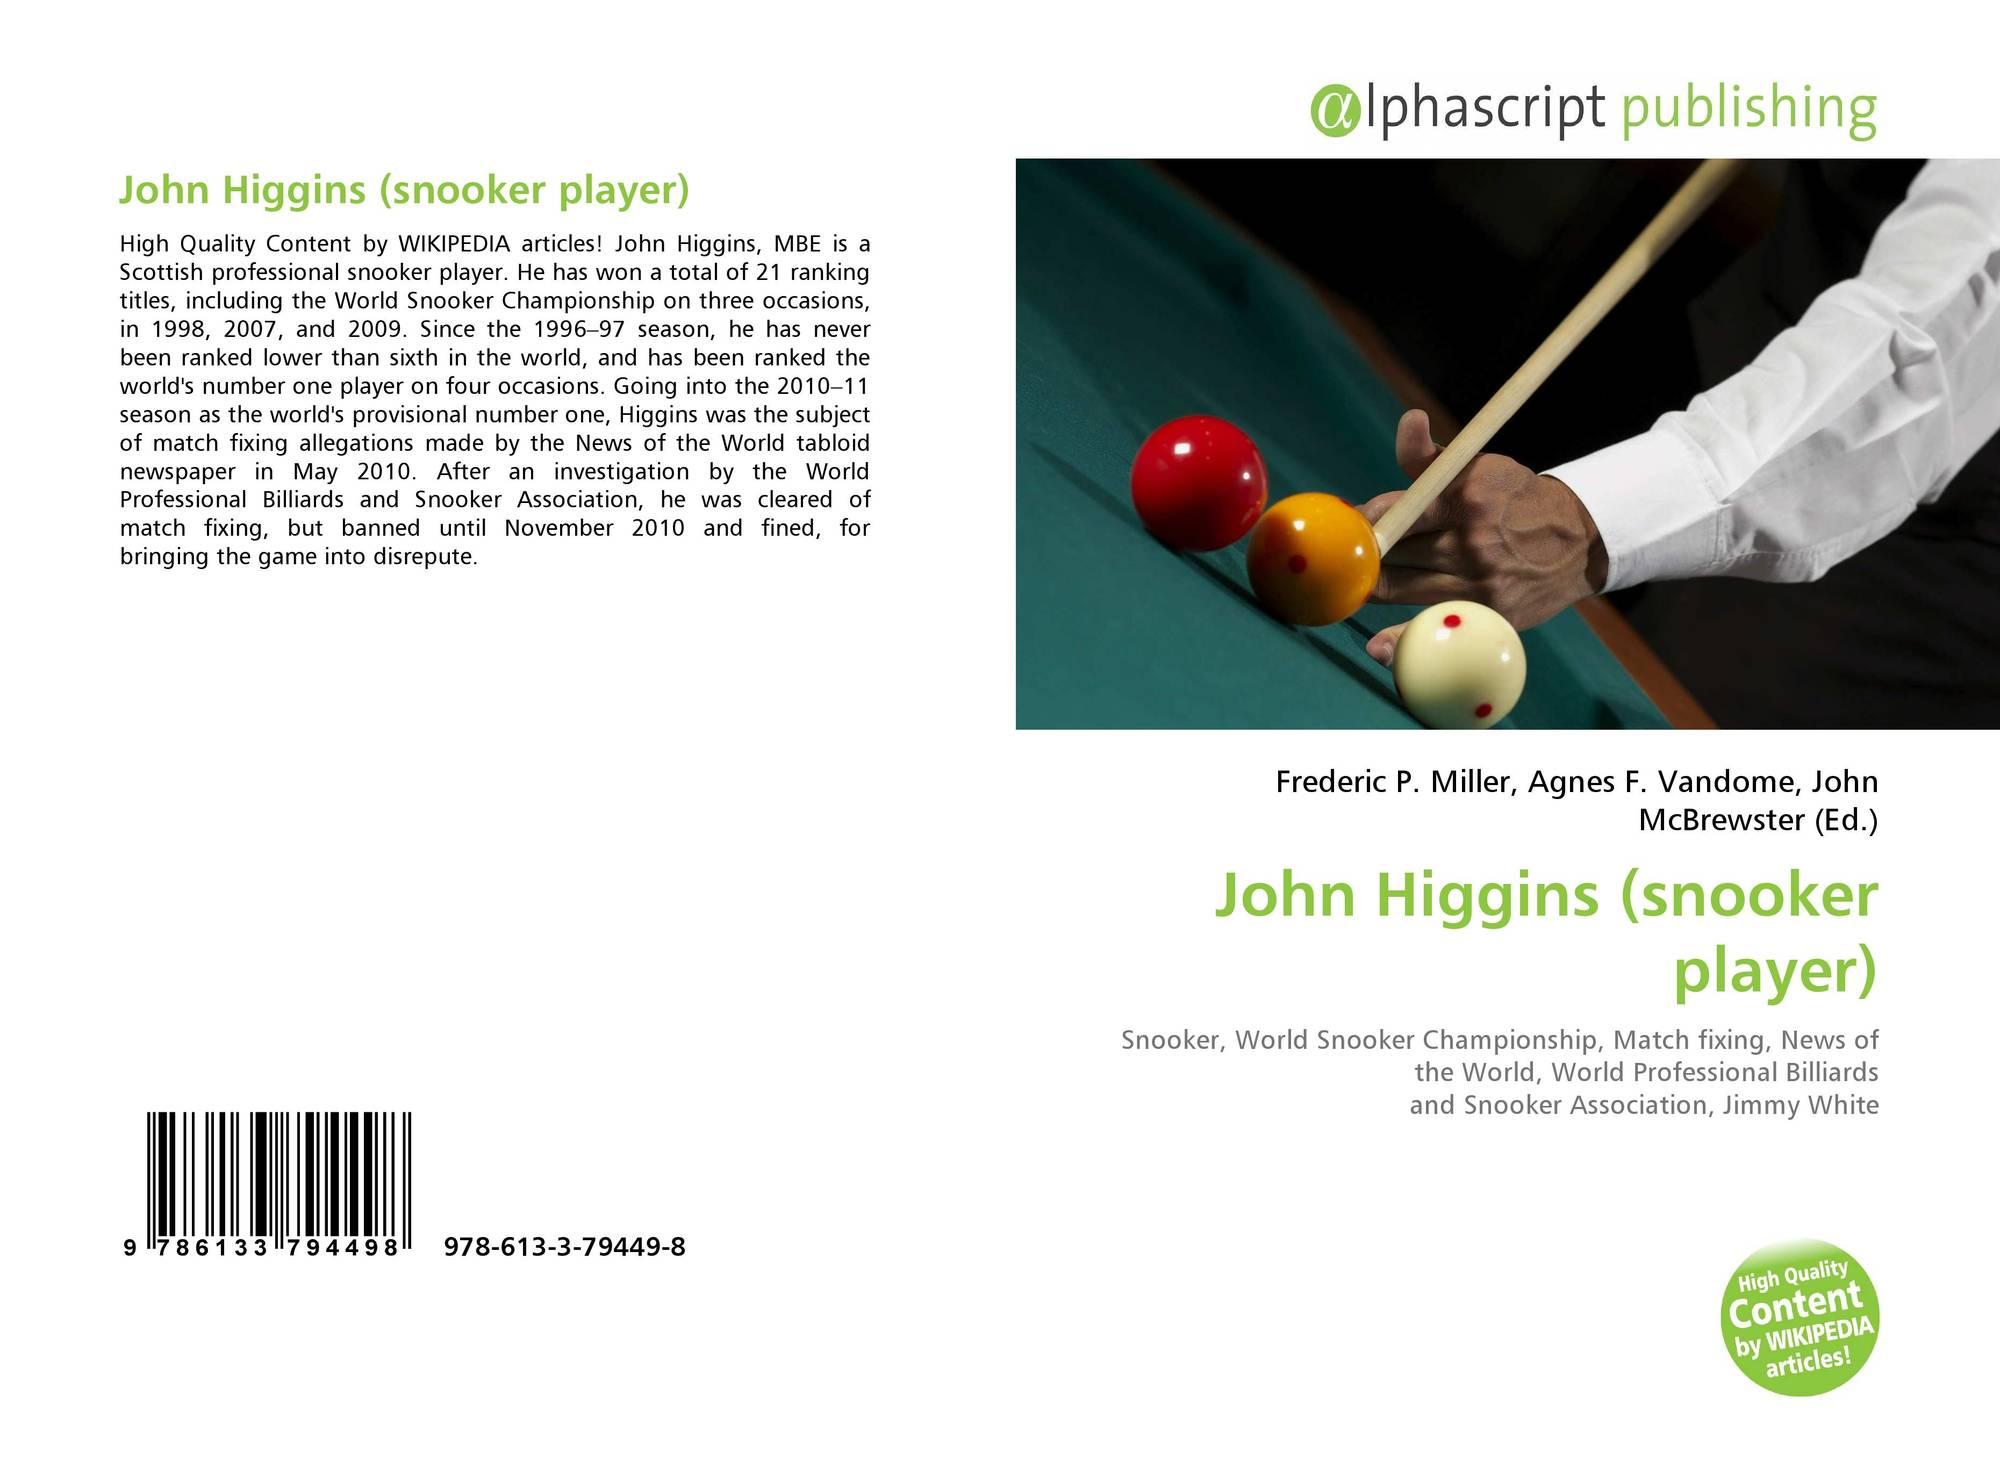 John Higgins (snooker player), 978-613-3-79449-8, 6133794496 ...